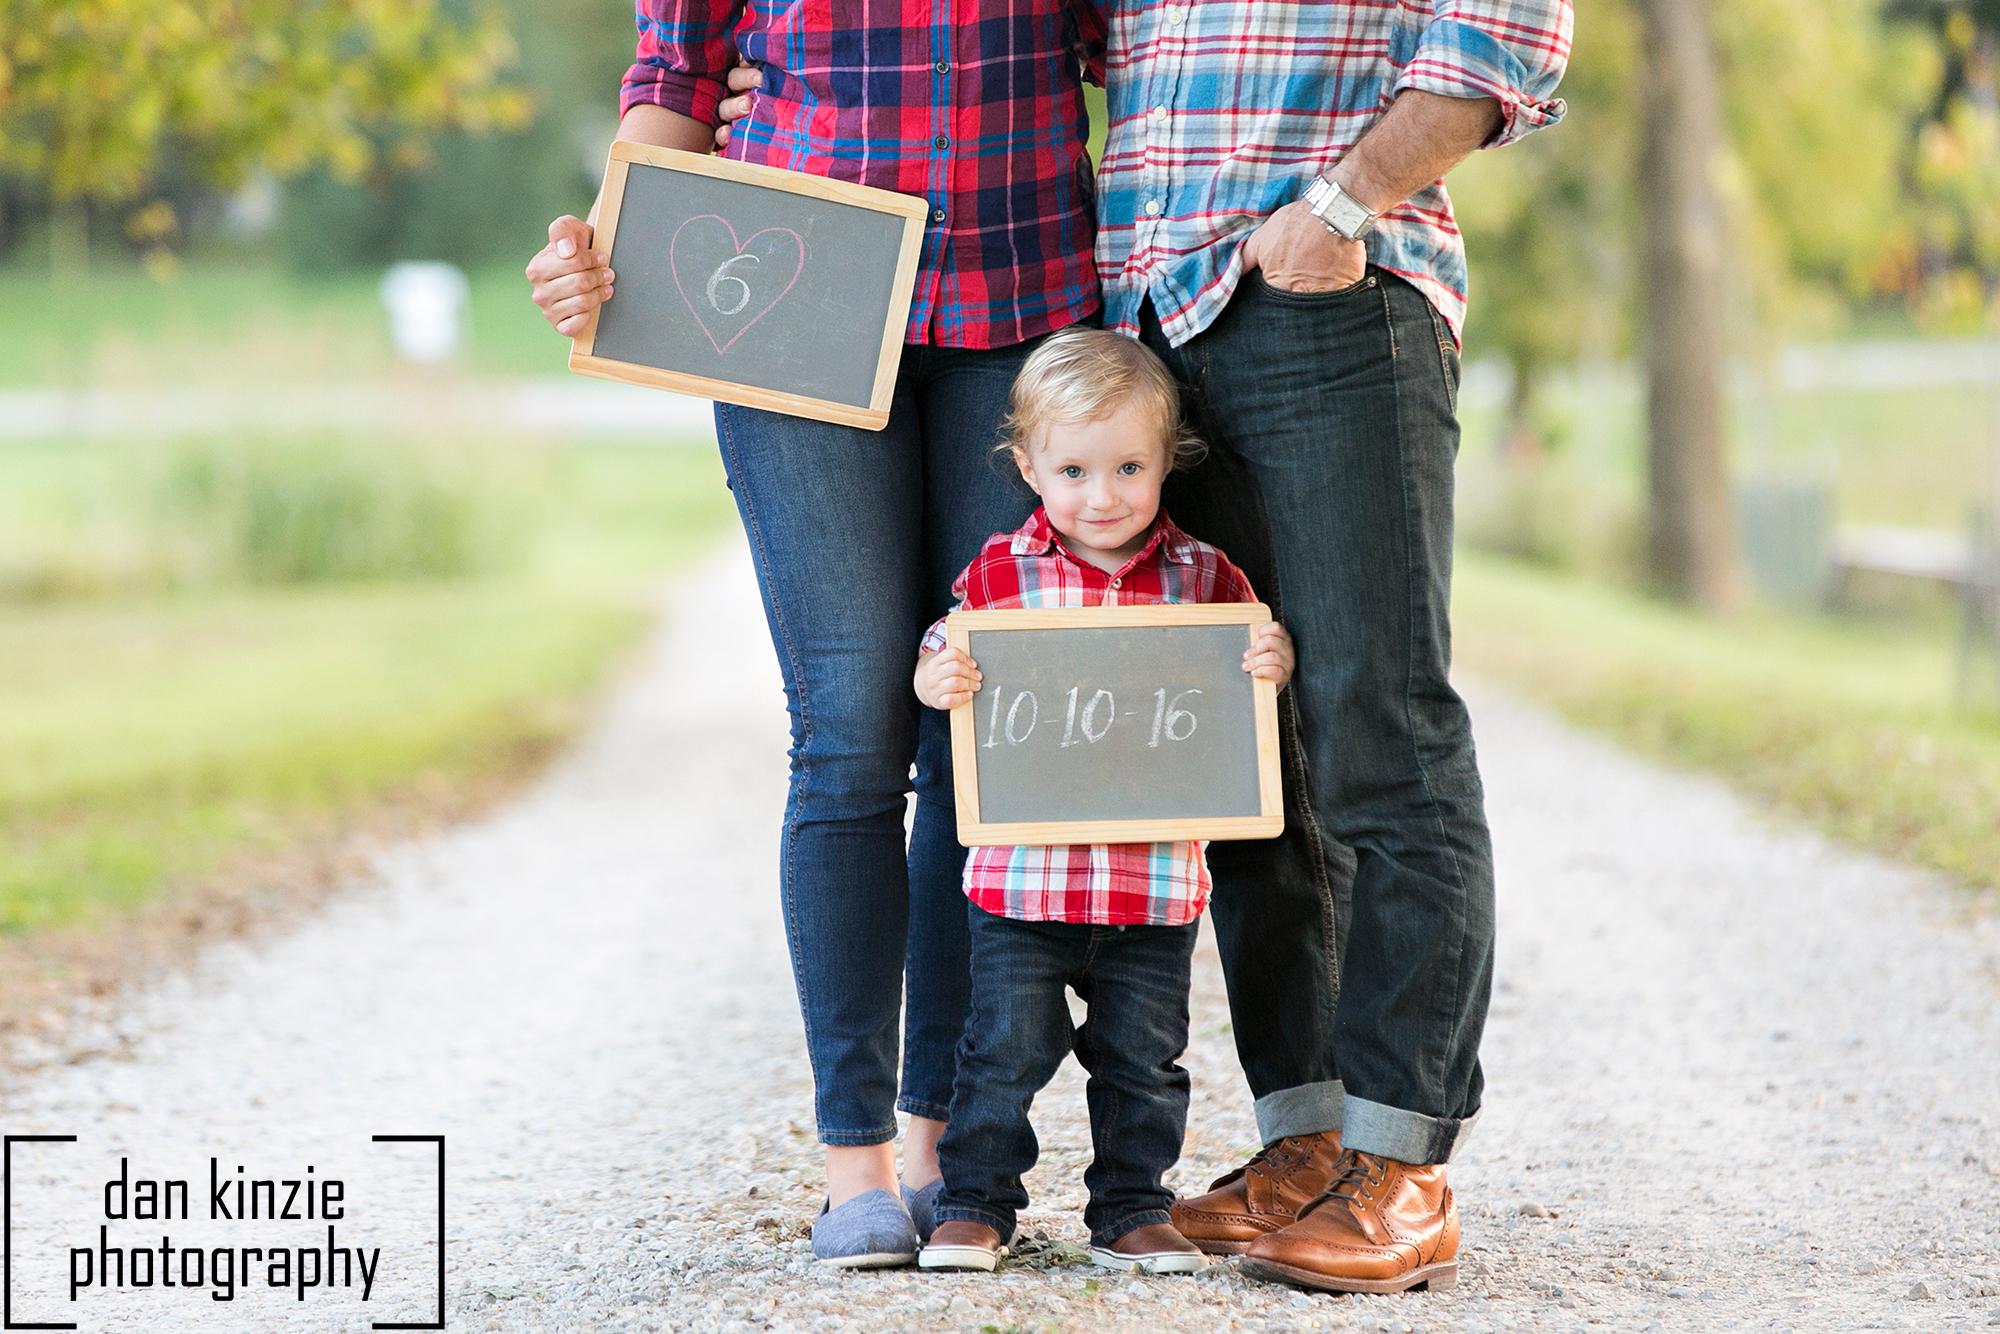 Grailville Family photos, ohio family photographer, professional loveland ohio photographer